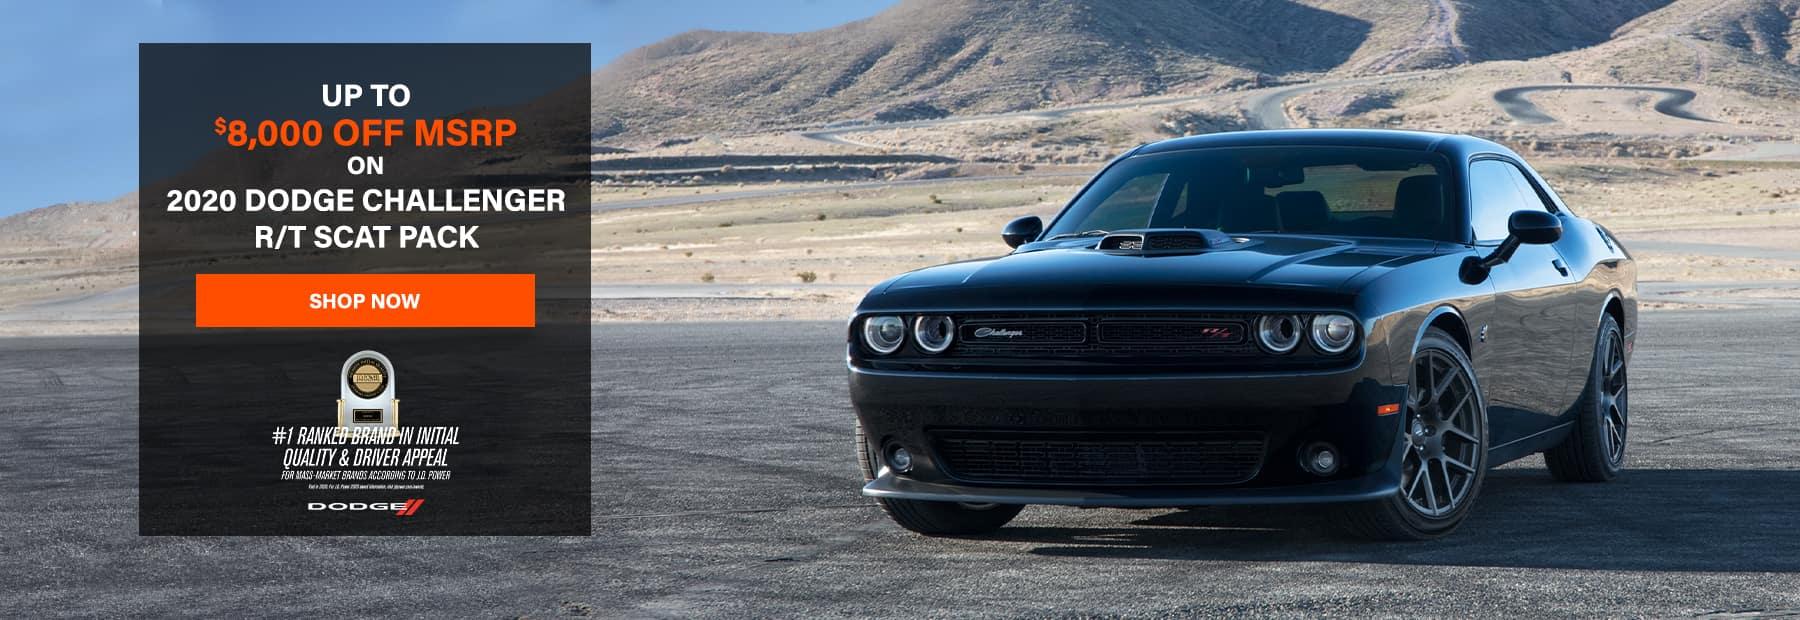 2020 Dodge Challenger R/T Scat Pack - Up to $8,000 OFF MSRP!